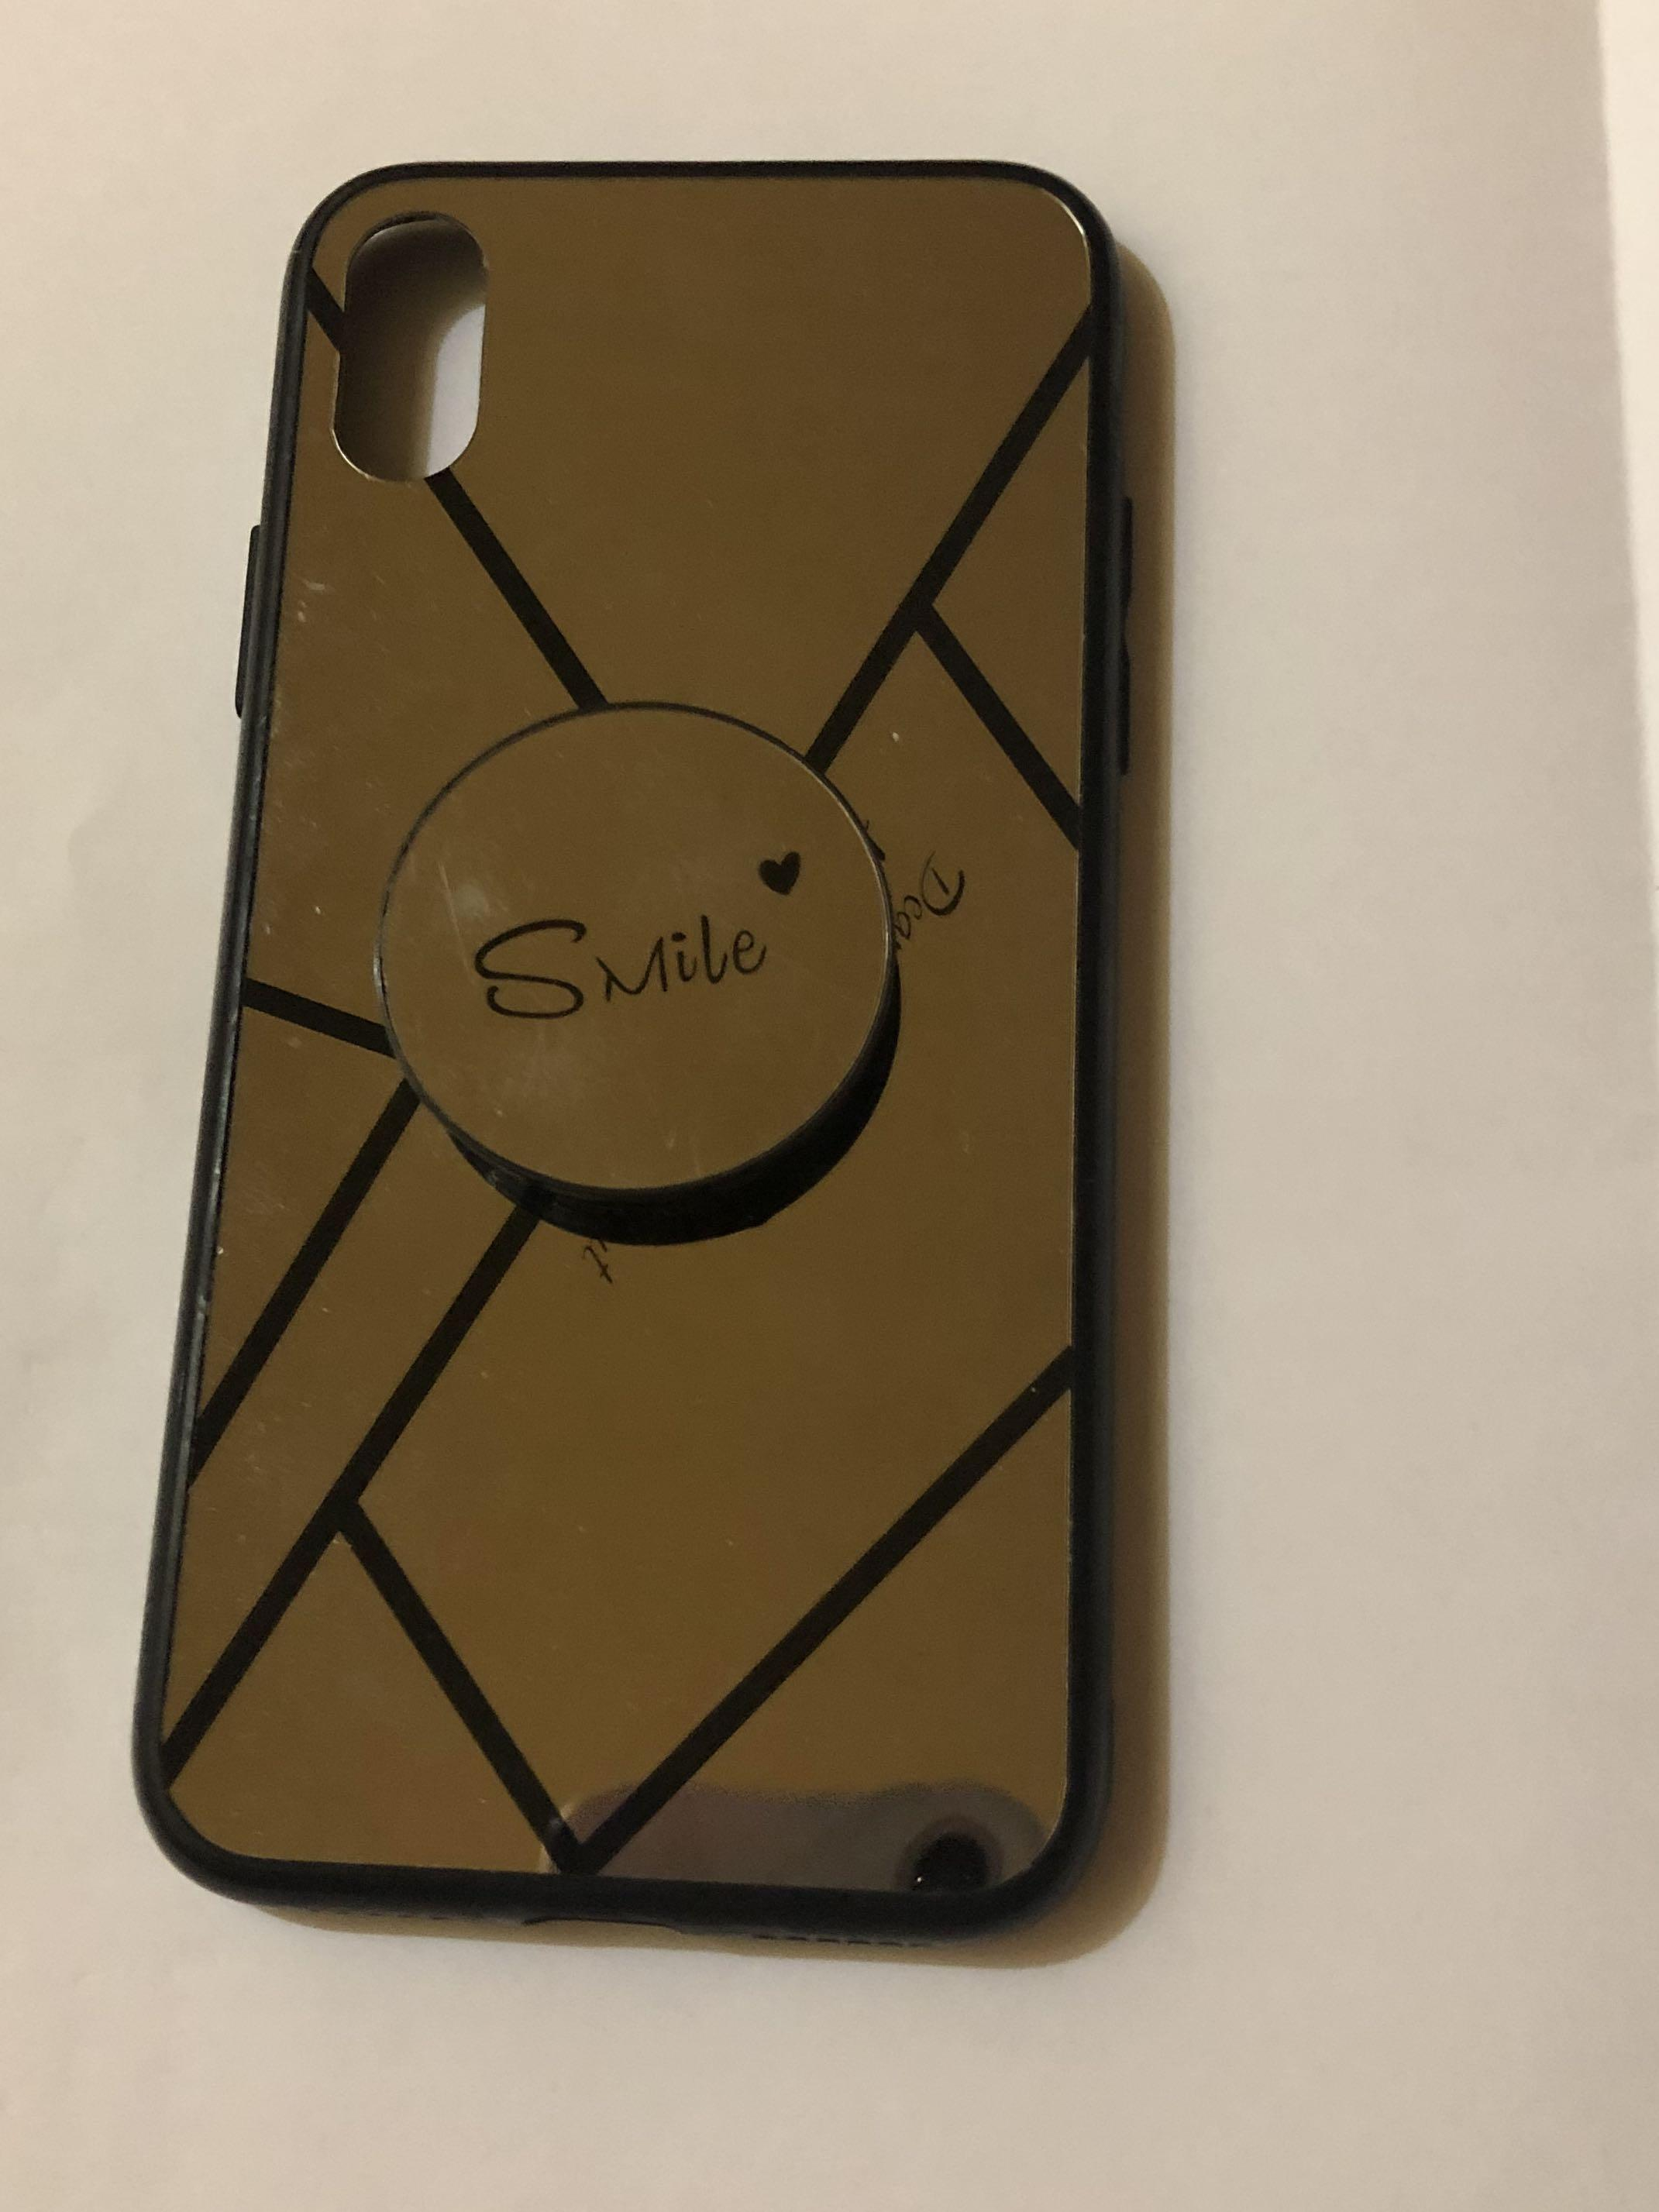 Mirror Case with Smile Pop socket